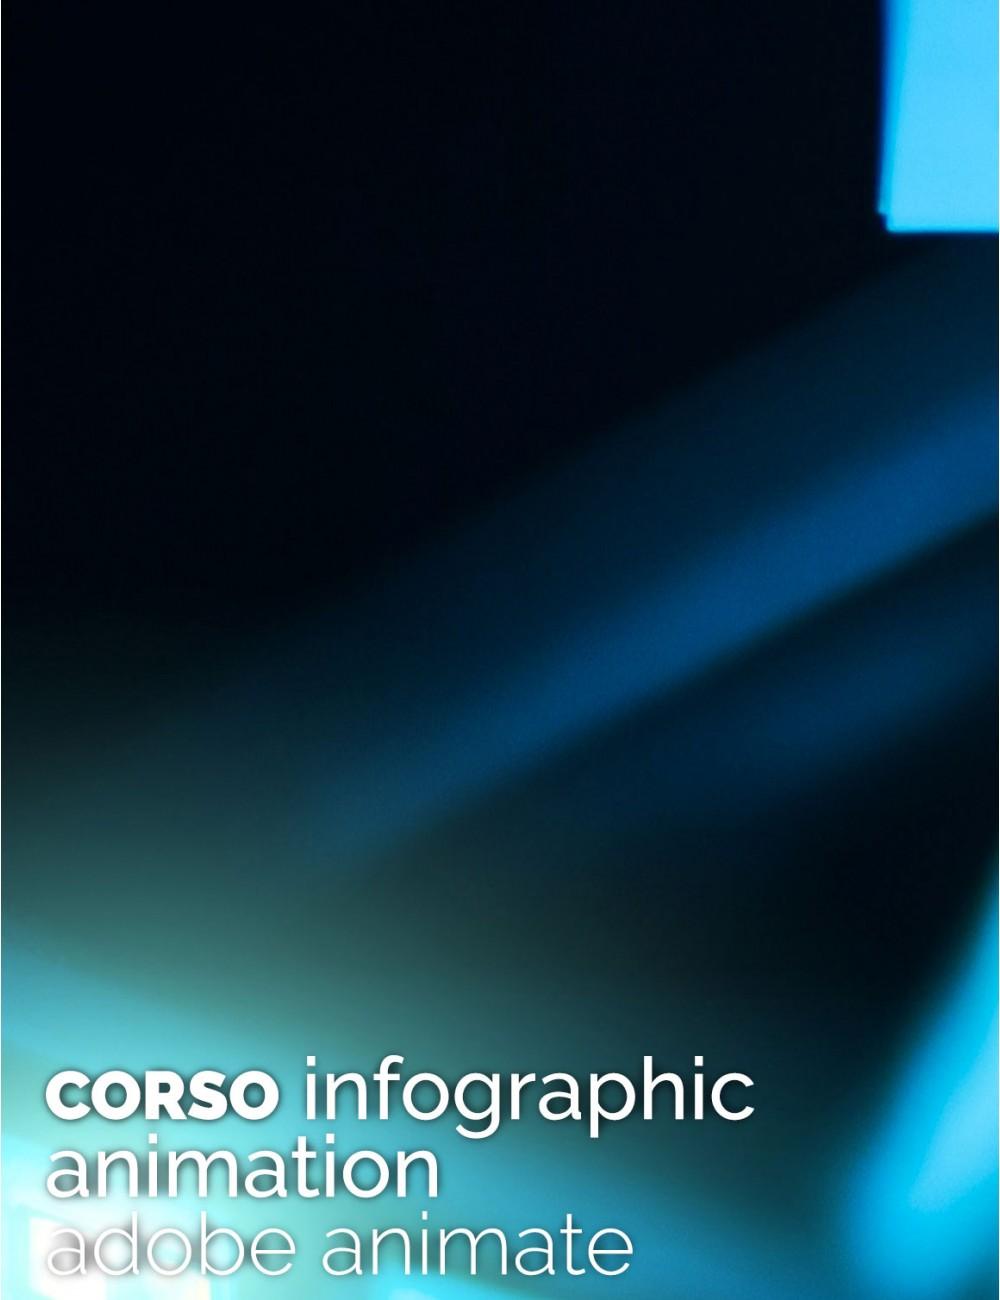 Corso Infographic Animation con Adobe Animate